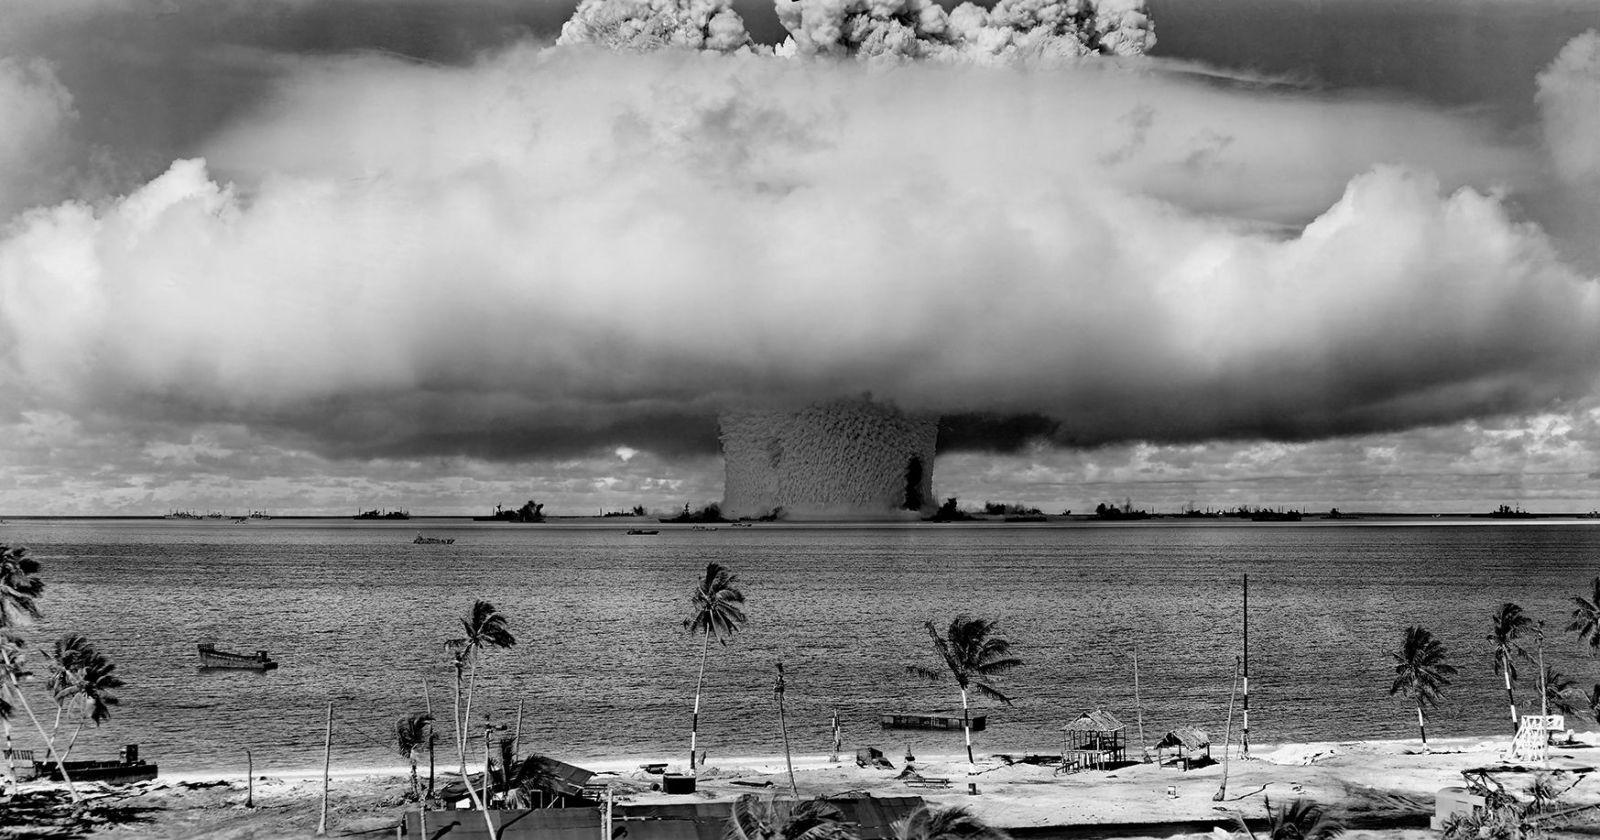 Atom bomb explosion